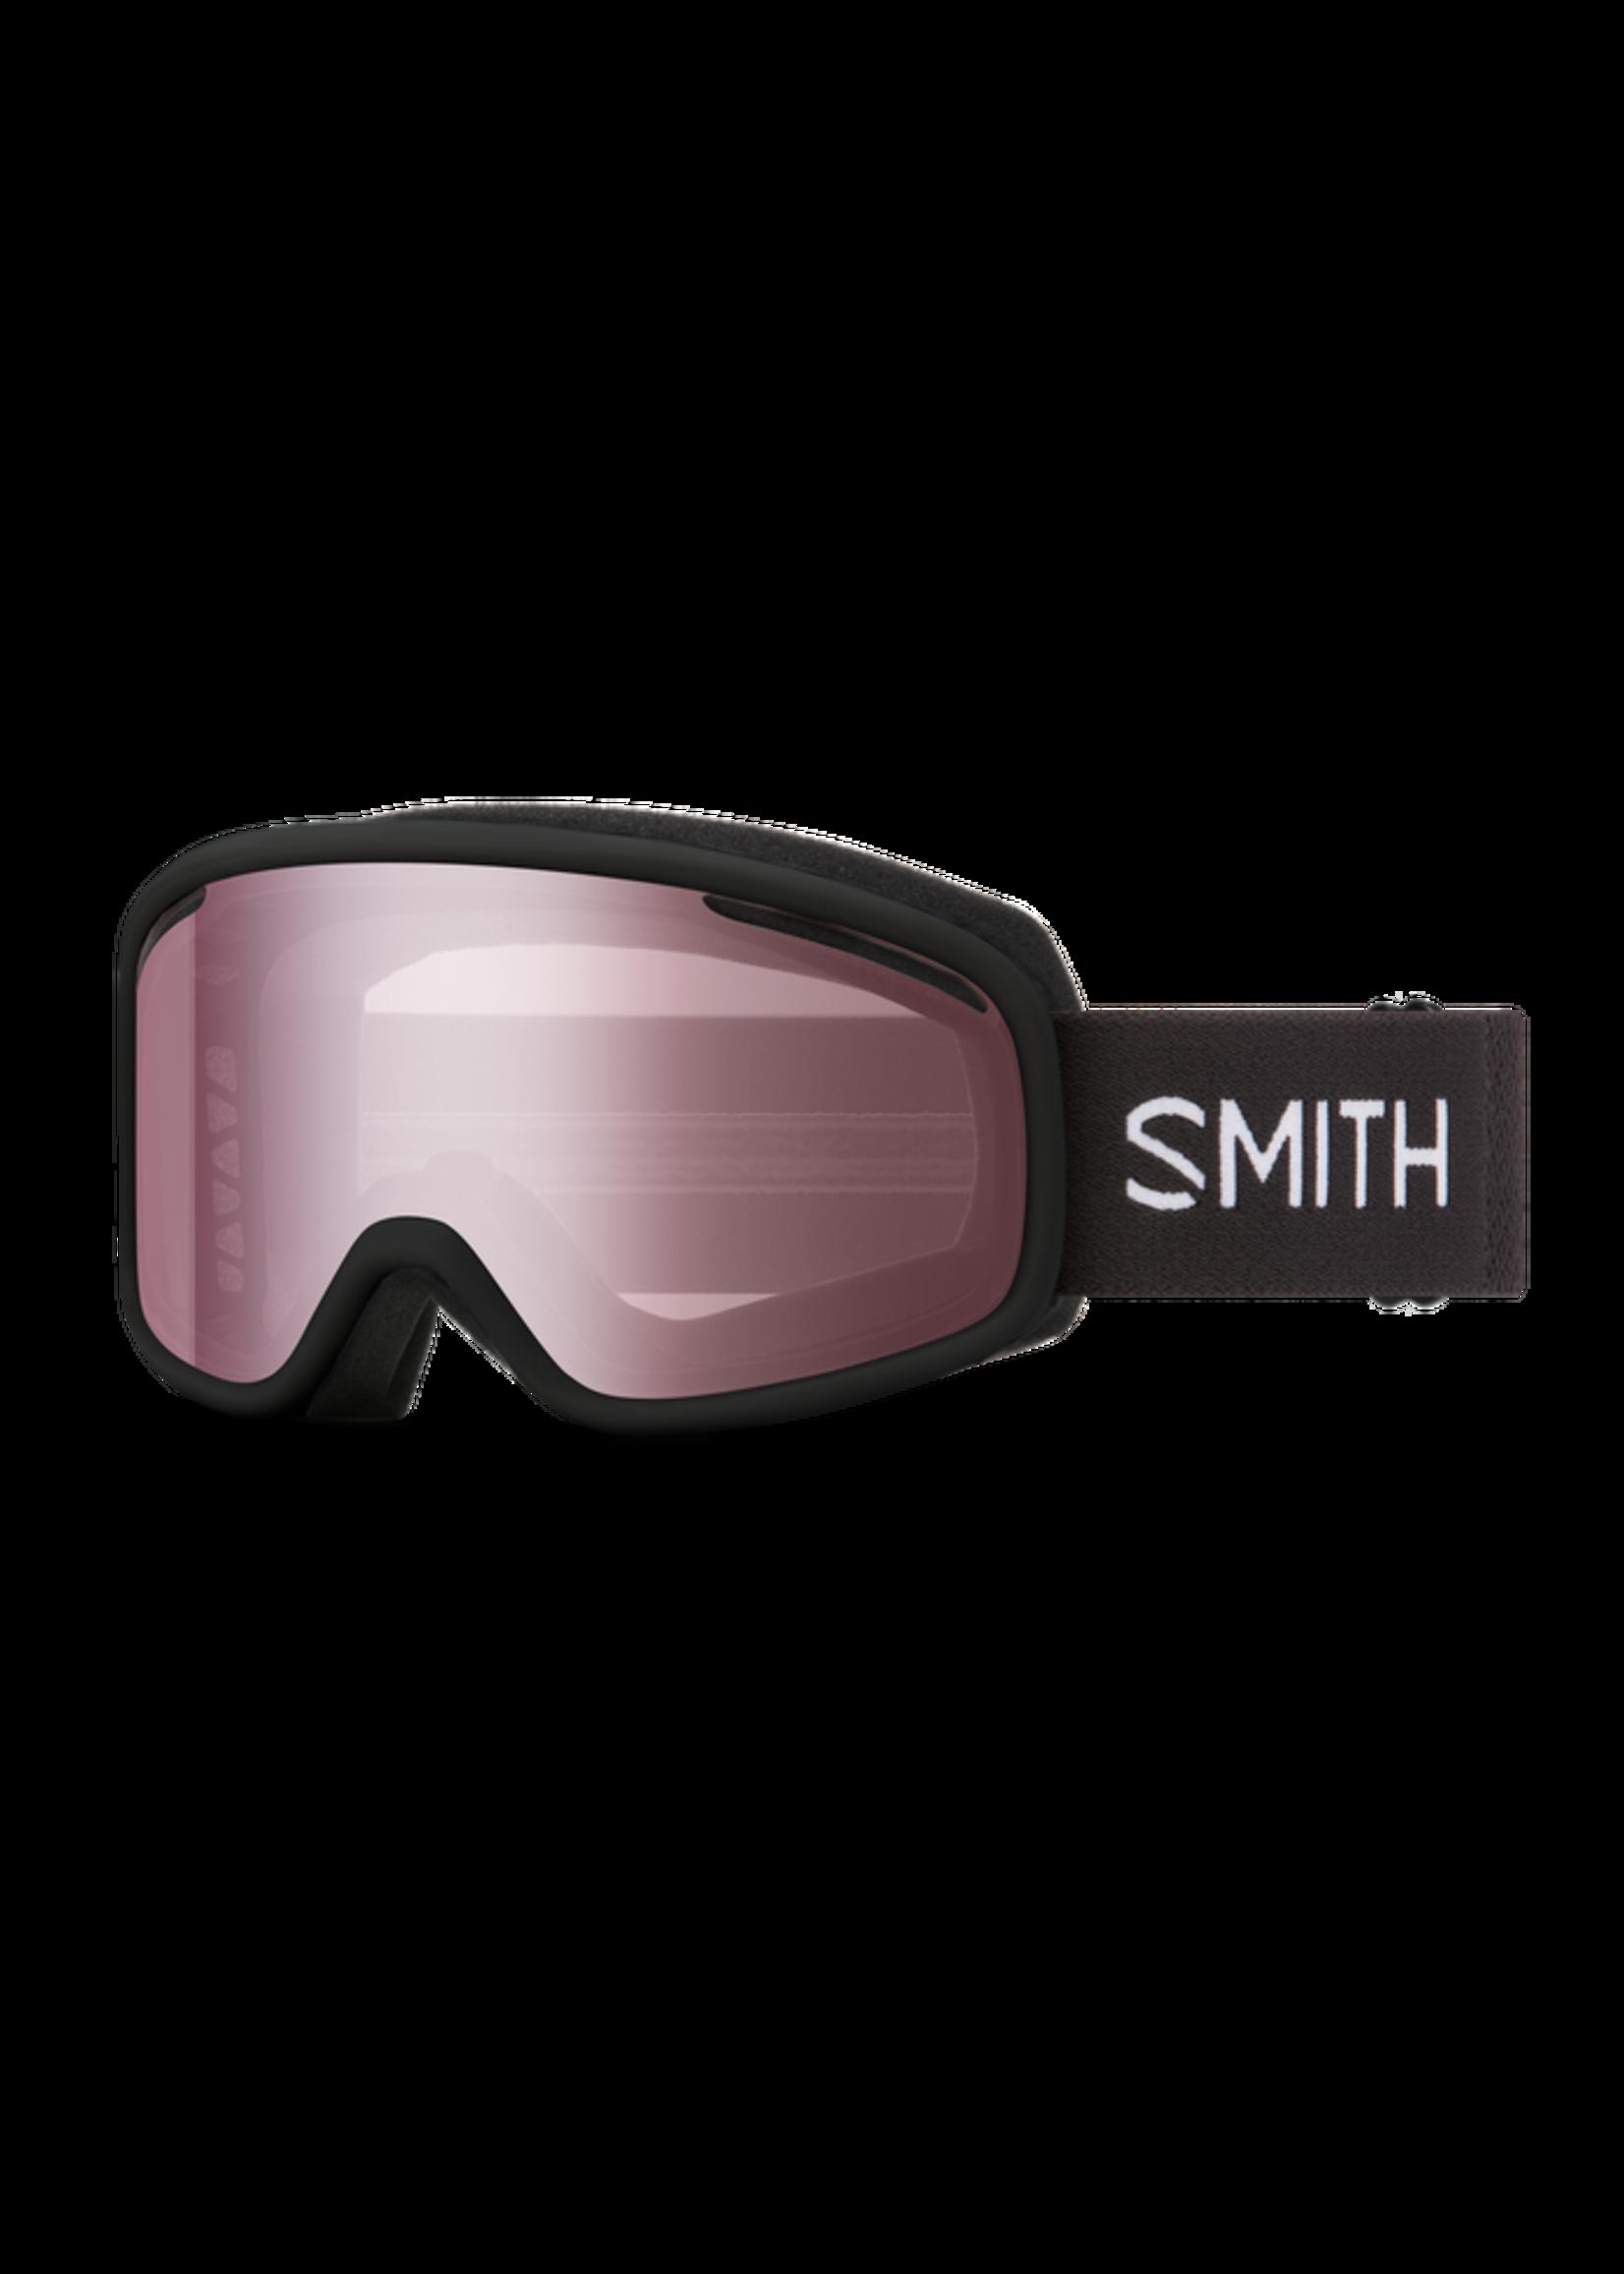 Smith VOGUE Black